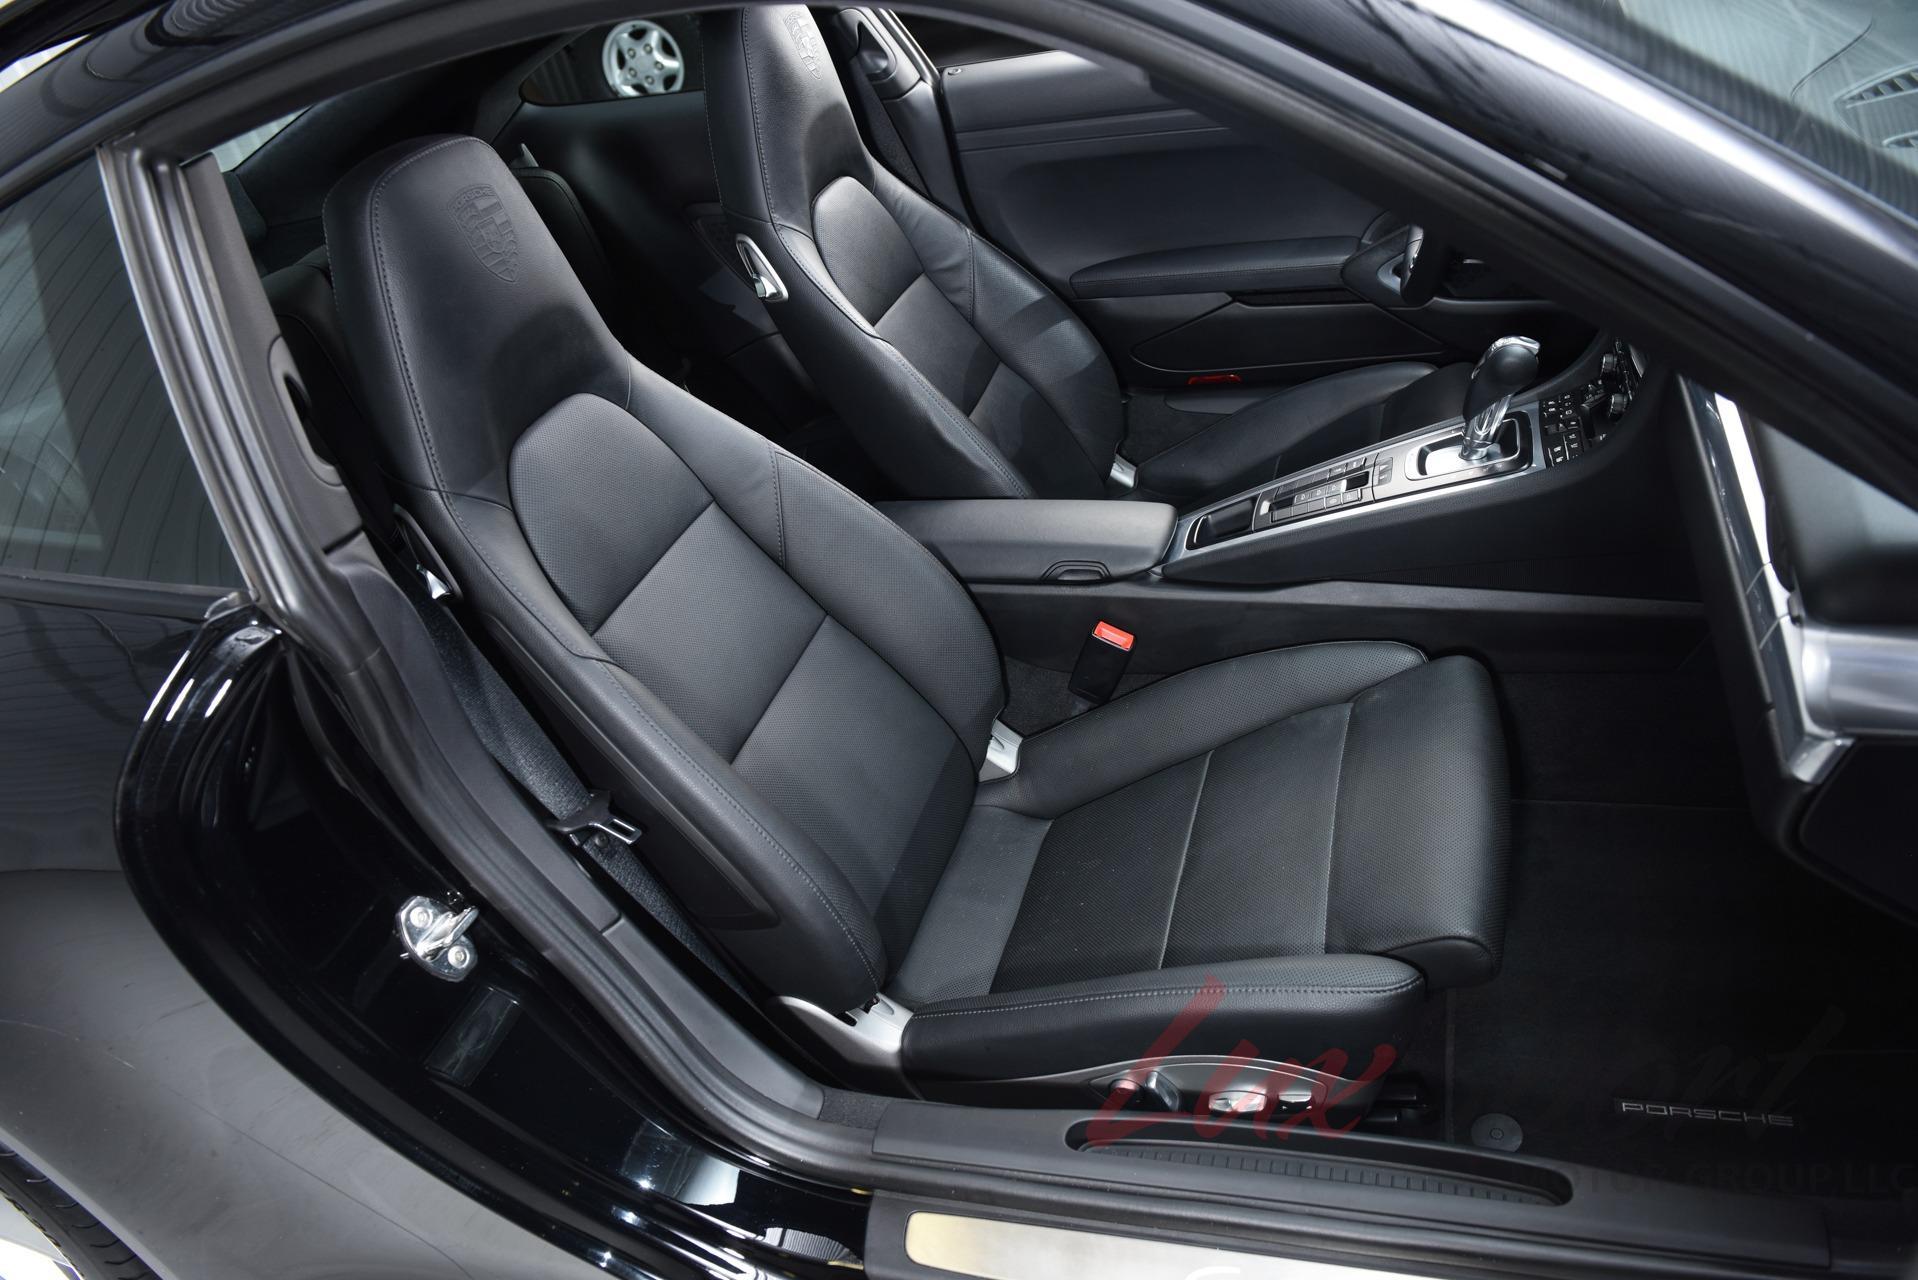 Used 2013 Porsche 991 Carrera 2 Coupe  | New Hyde Park, NY